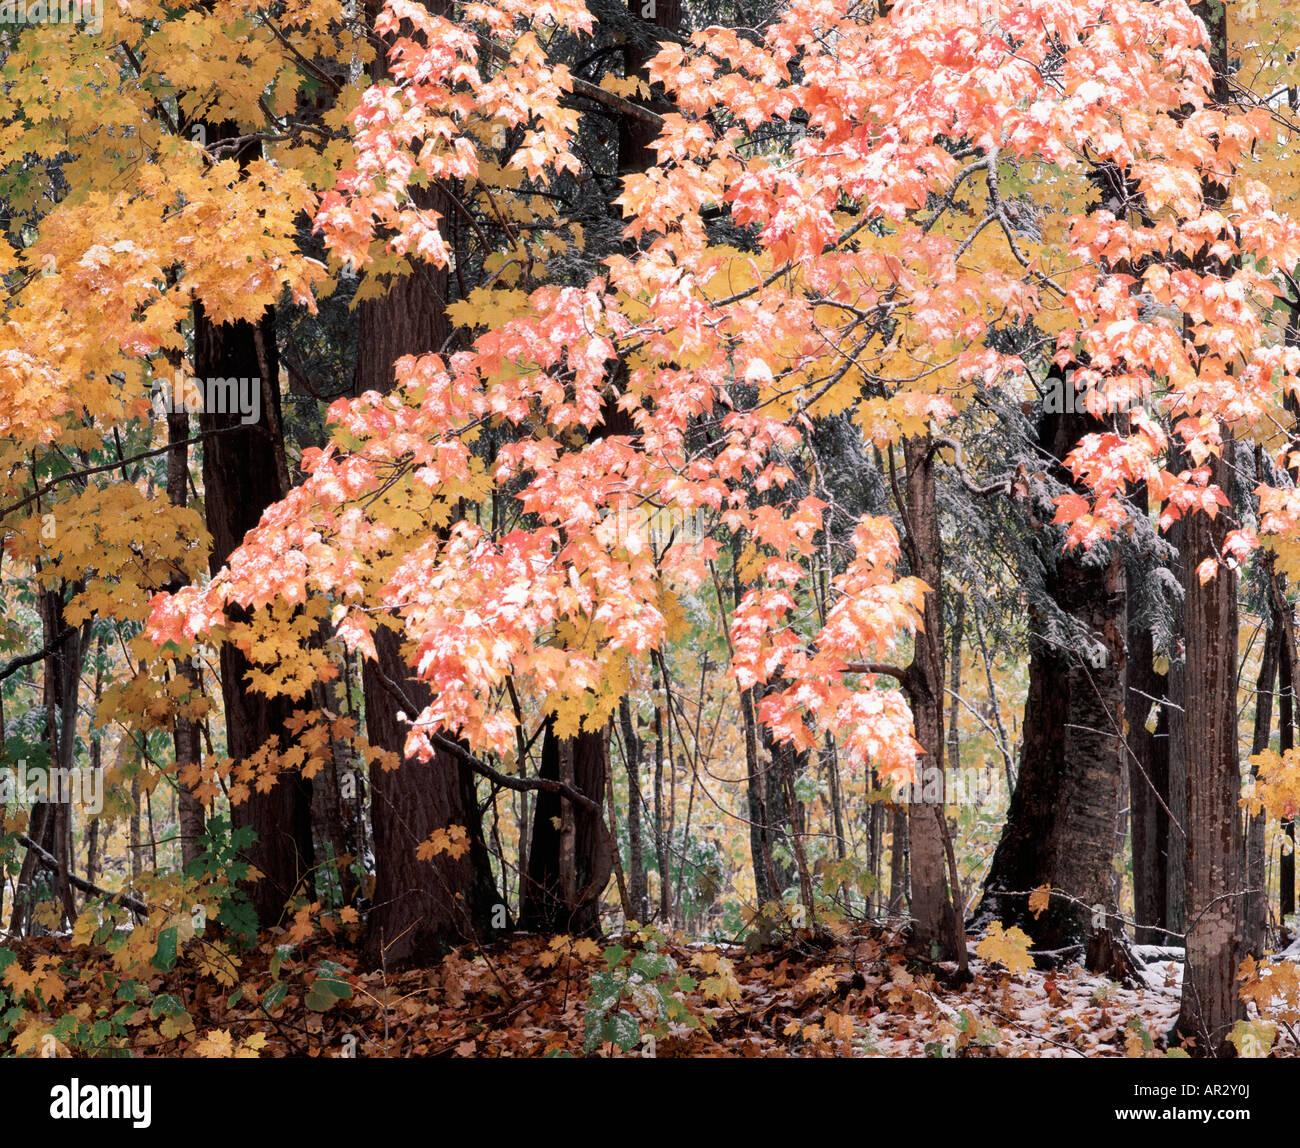 snow on autumn trees, Ottawa National Forest, Upper Peninsula, Michigan USA - Stock Image